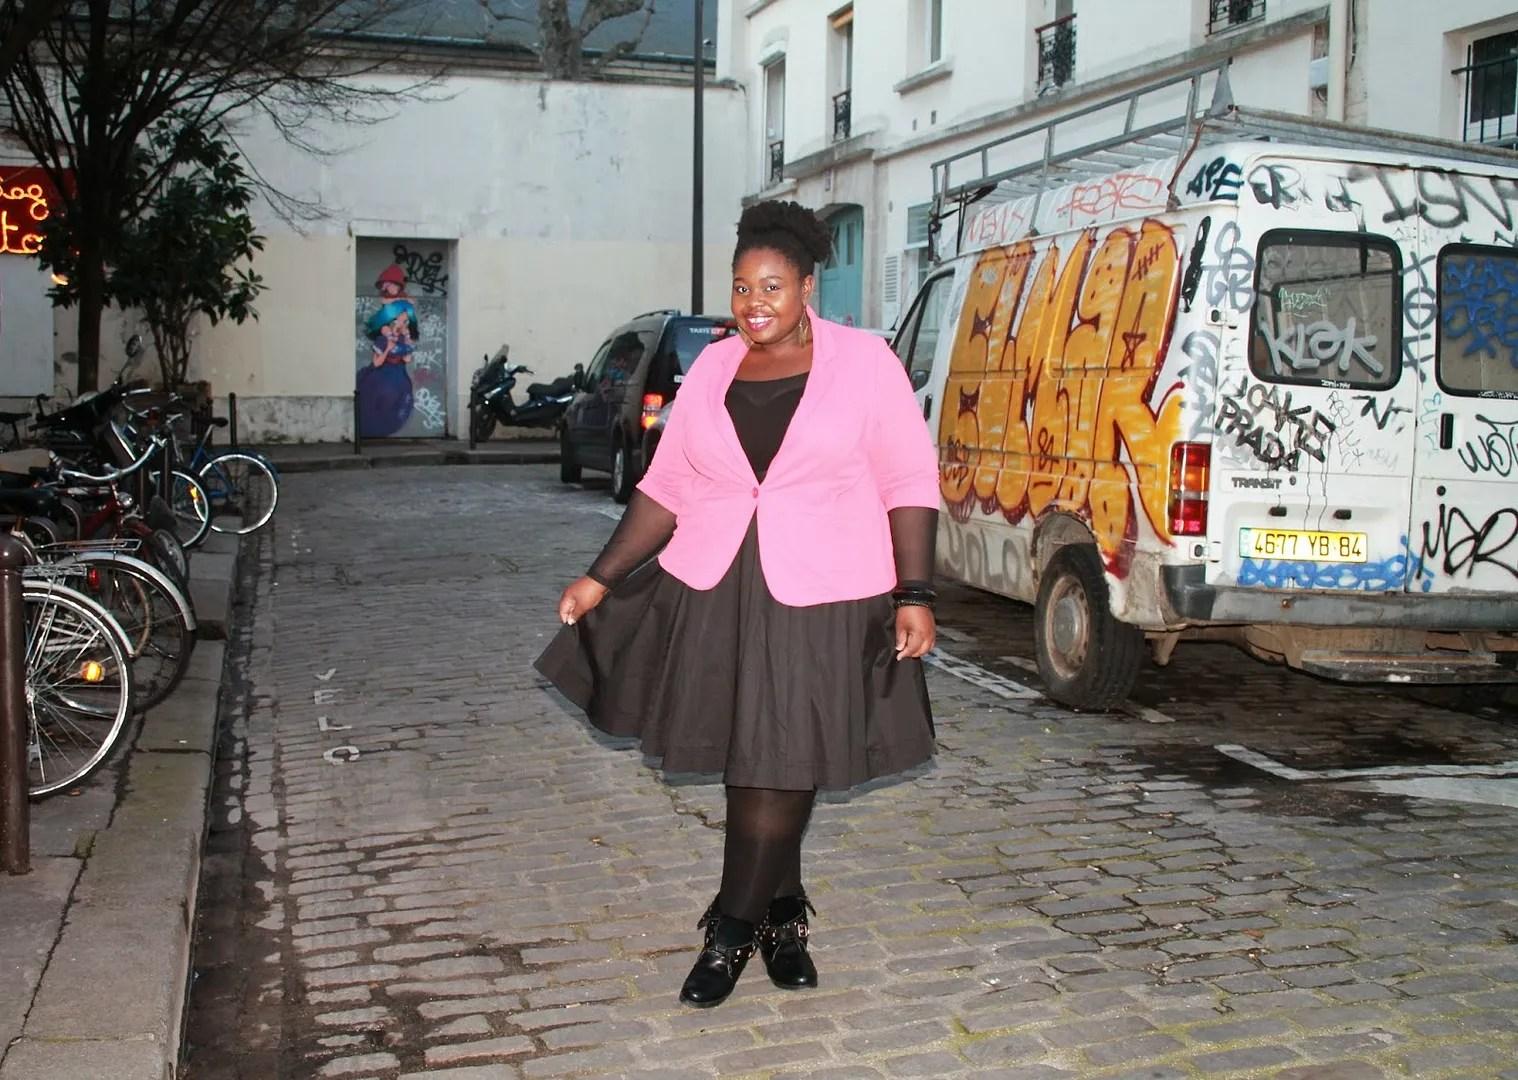 plus size woman wearing black dress and pink blazer